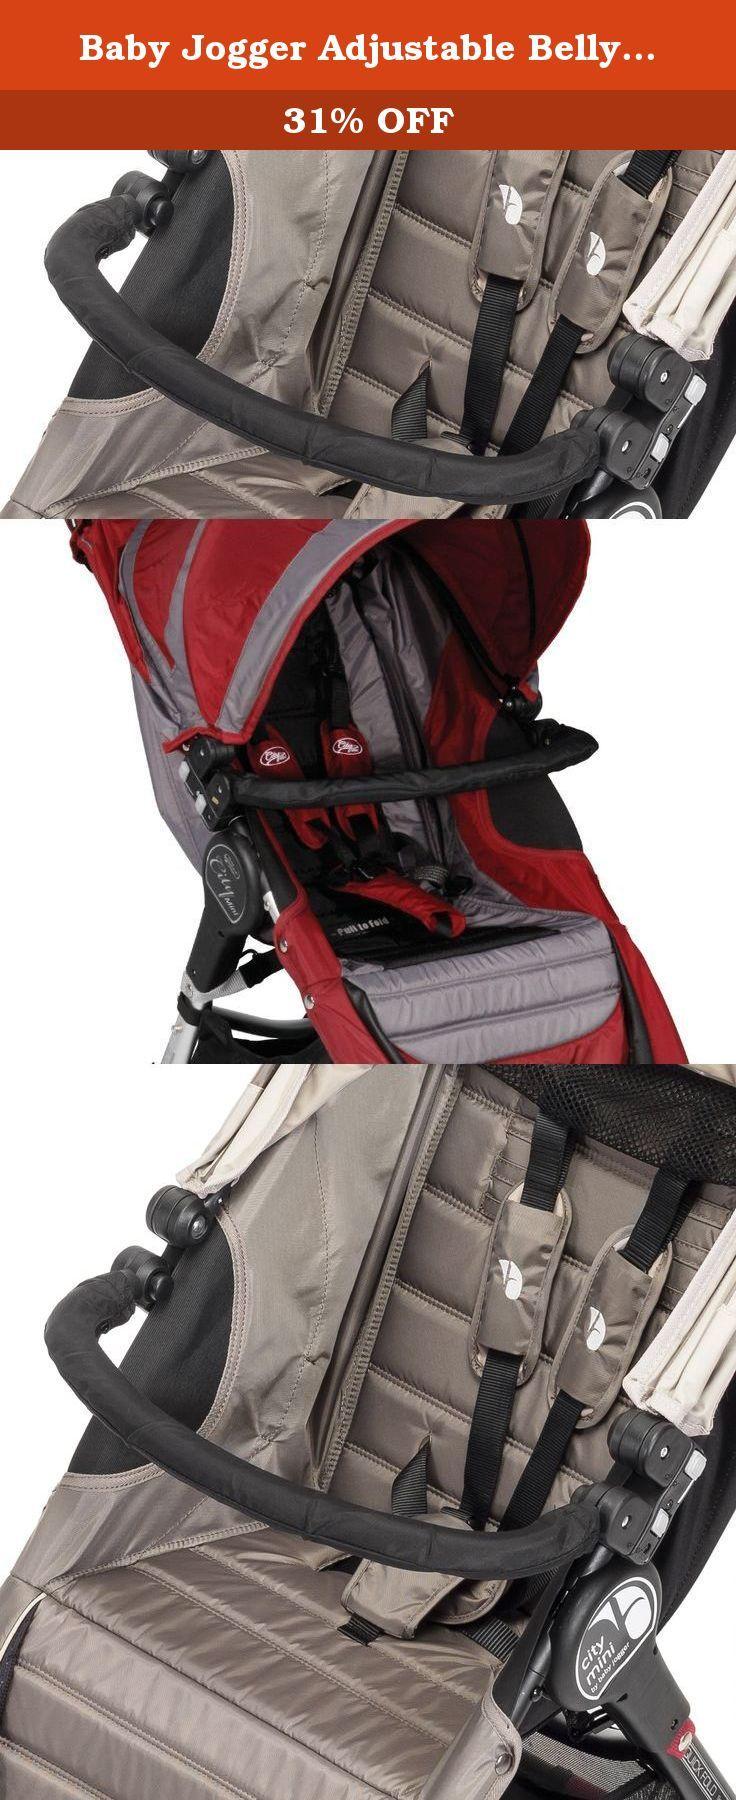 Baby Jogger Adjustable Belly Bar. The adjustable Belly Bar